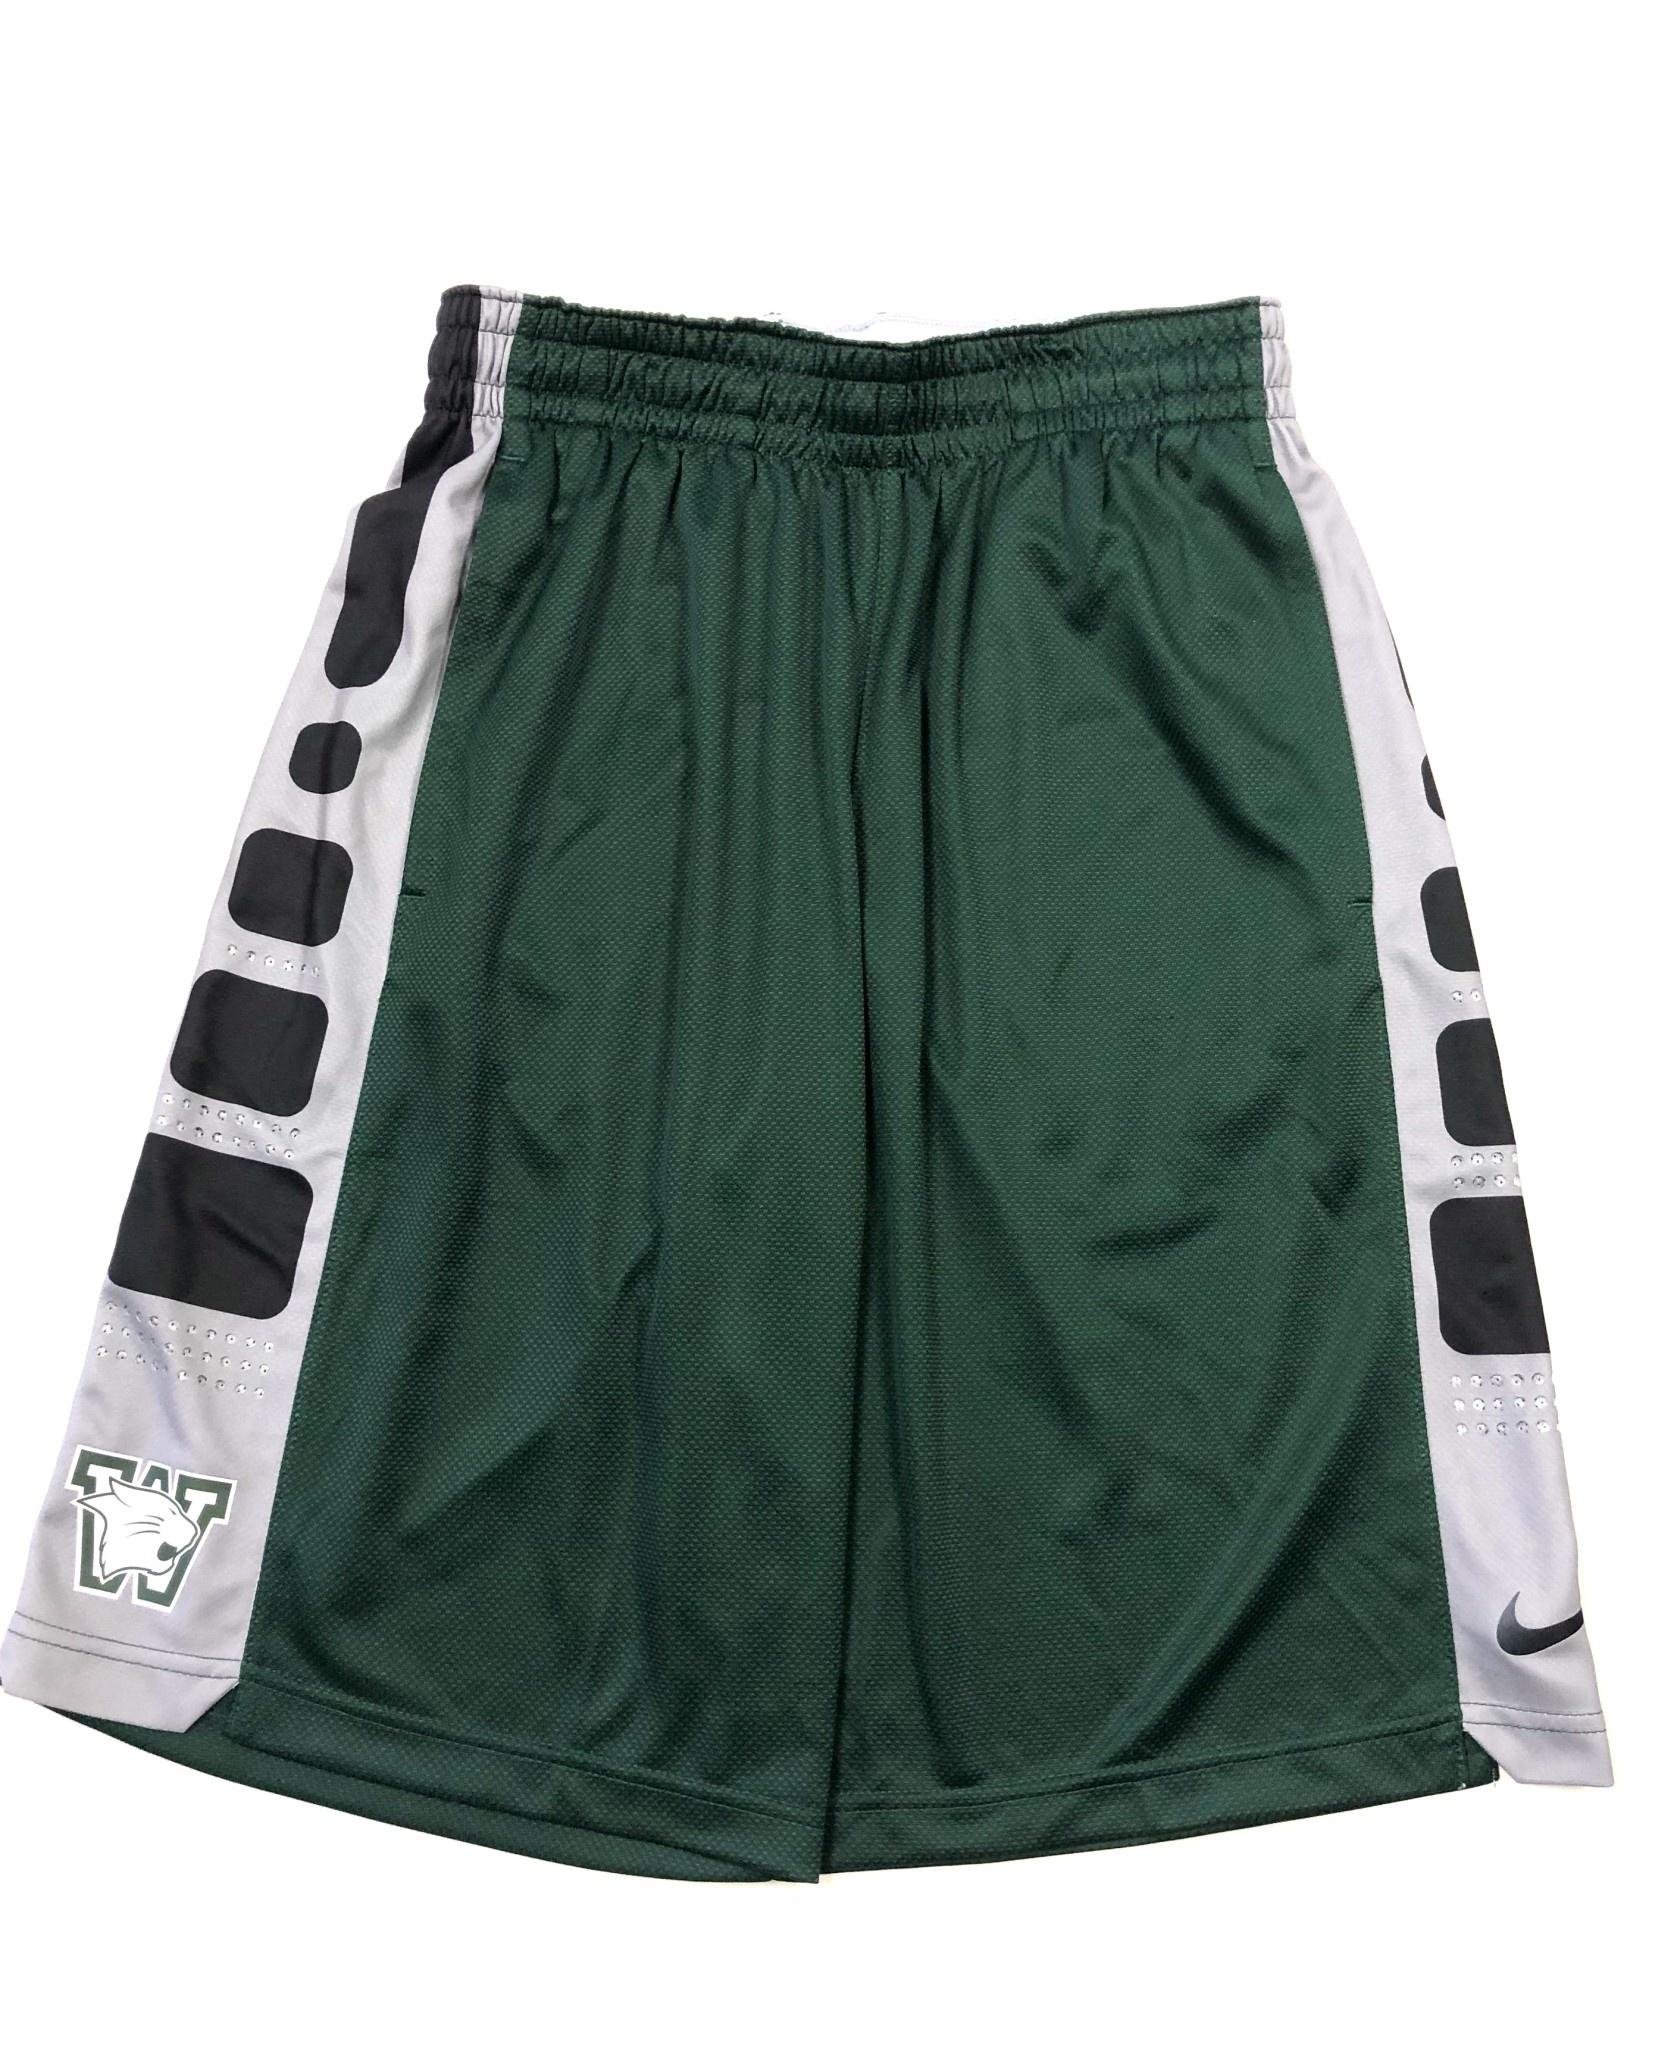 Nike Shorts: Nike Elite Stripe - Green